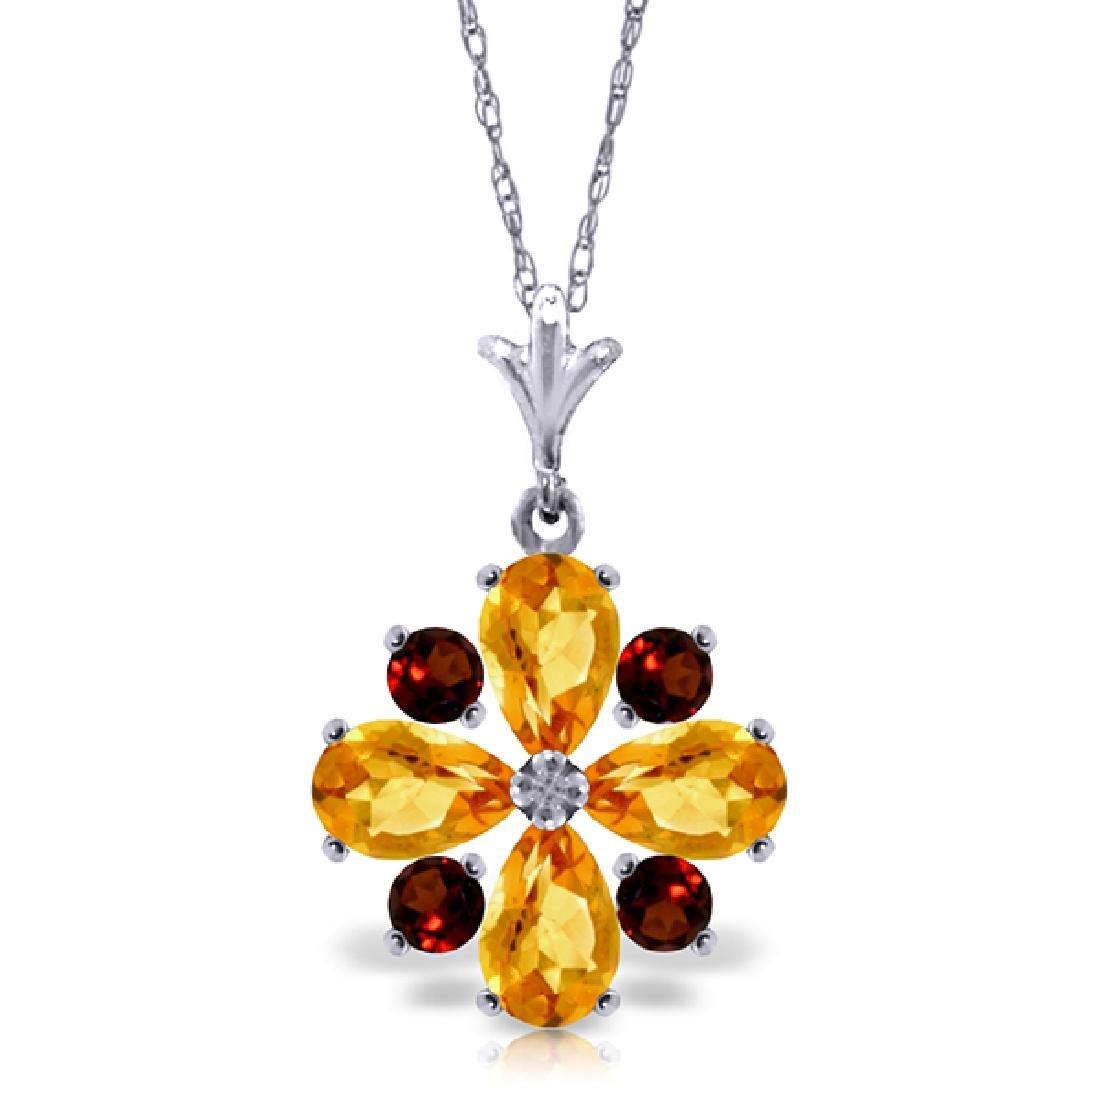 Genuine 2.43 ctw Citrine & Garnet Necklace Jewelry 14KT